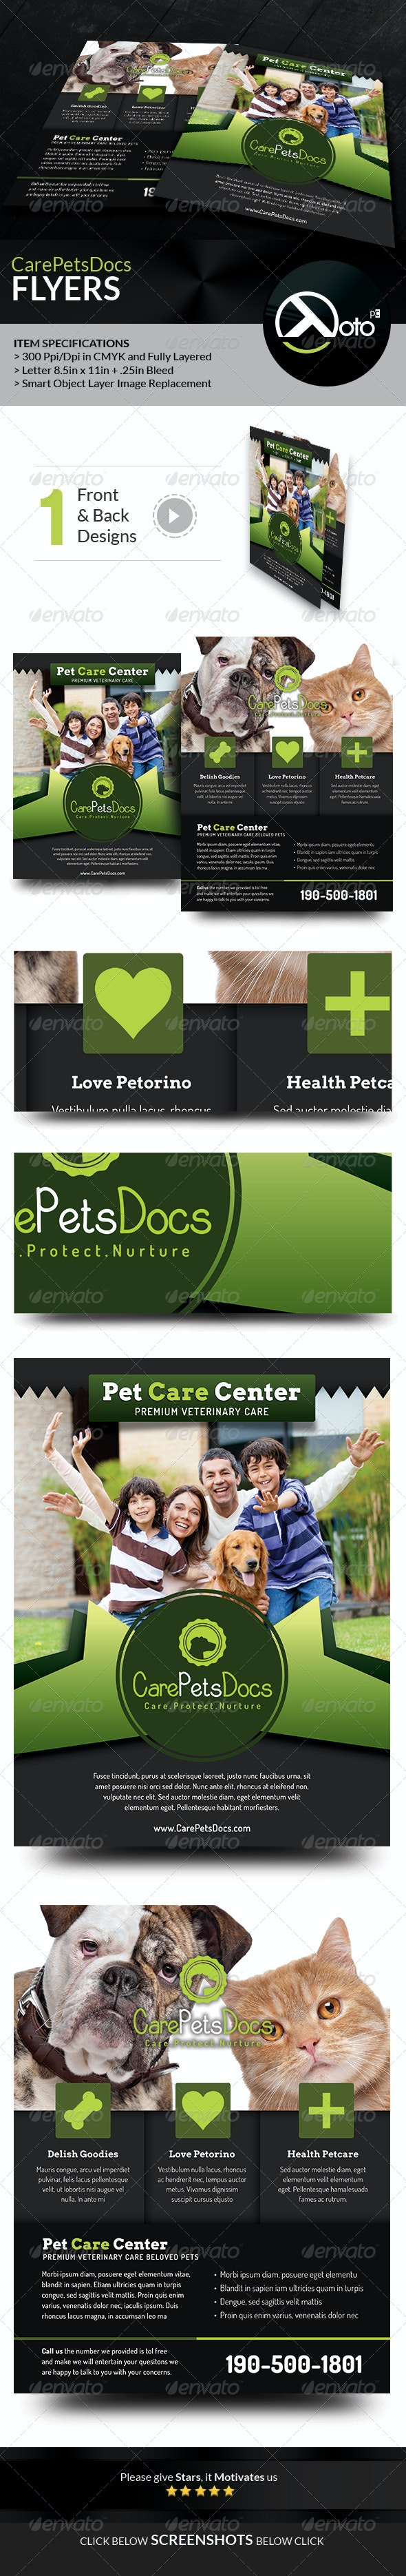 Care Pets Docs Veterinary Flyers - Flyers Print Templates